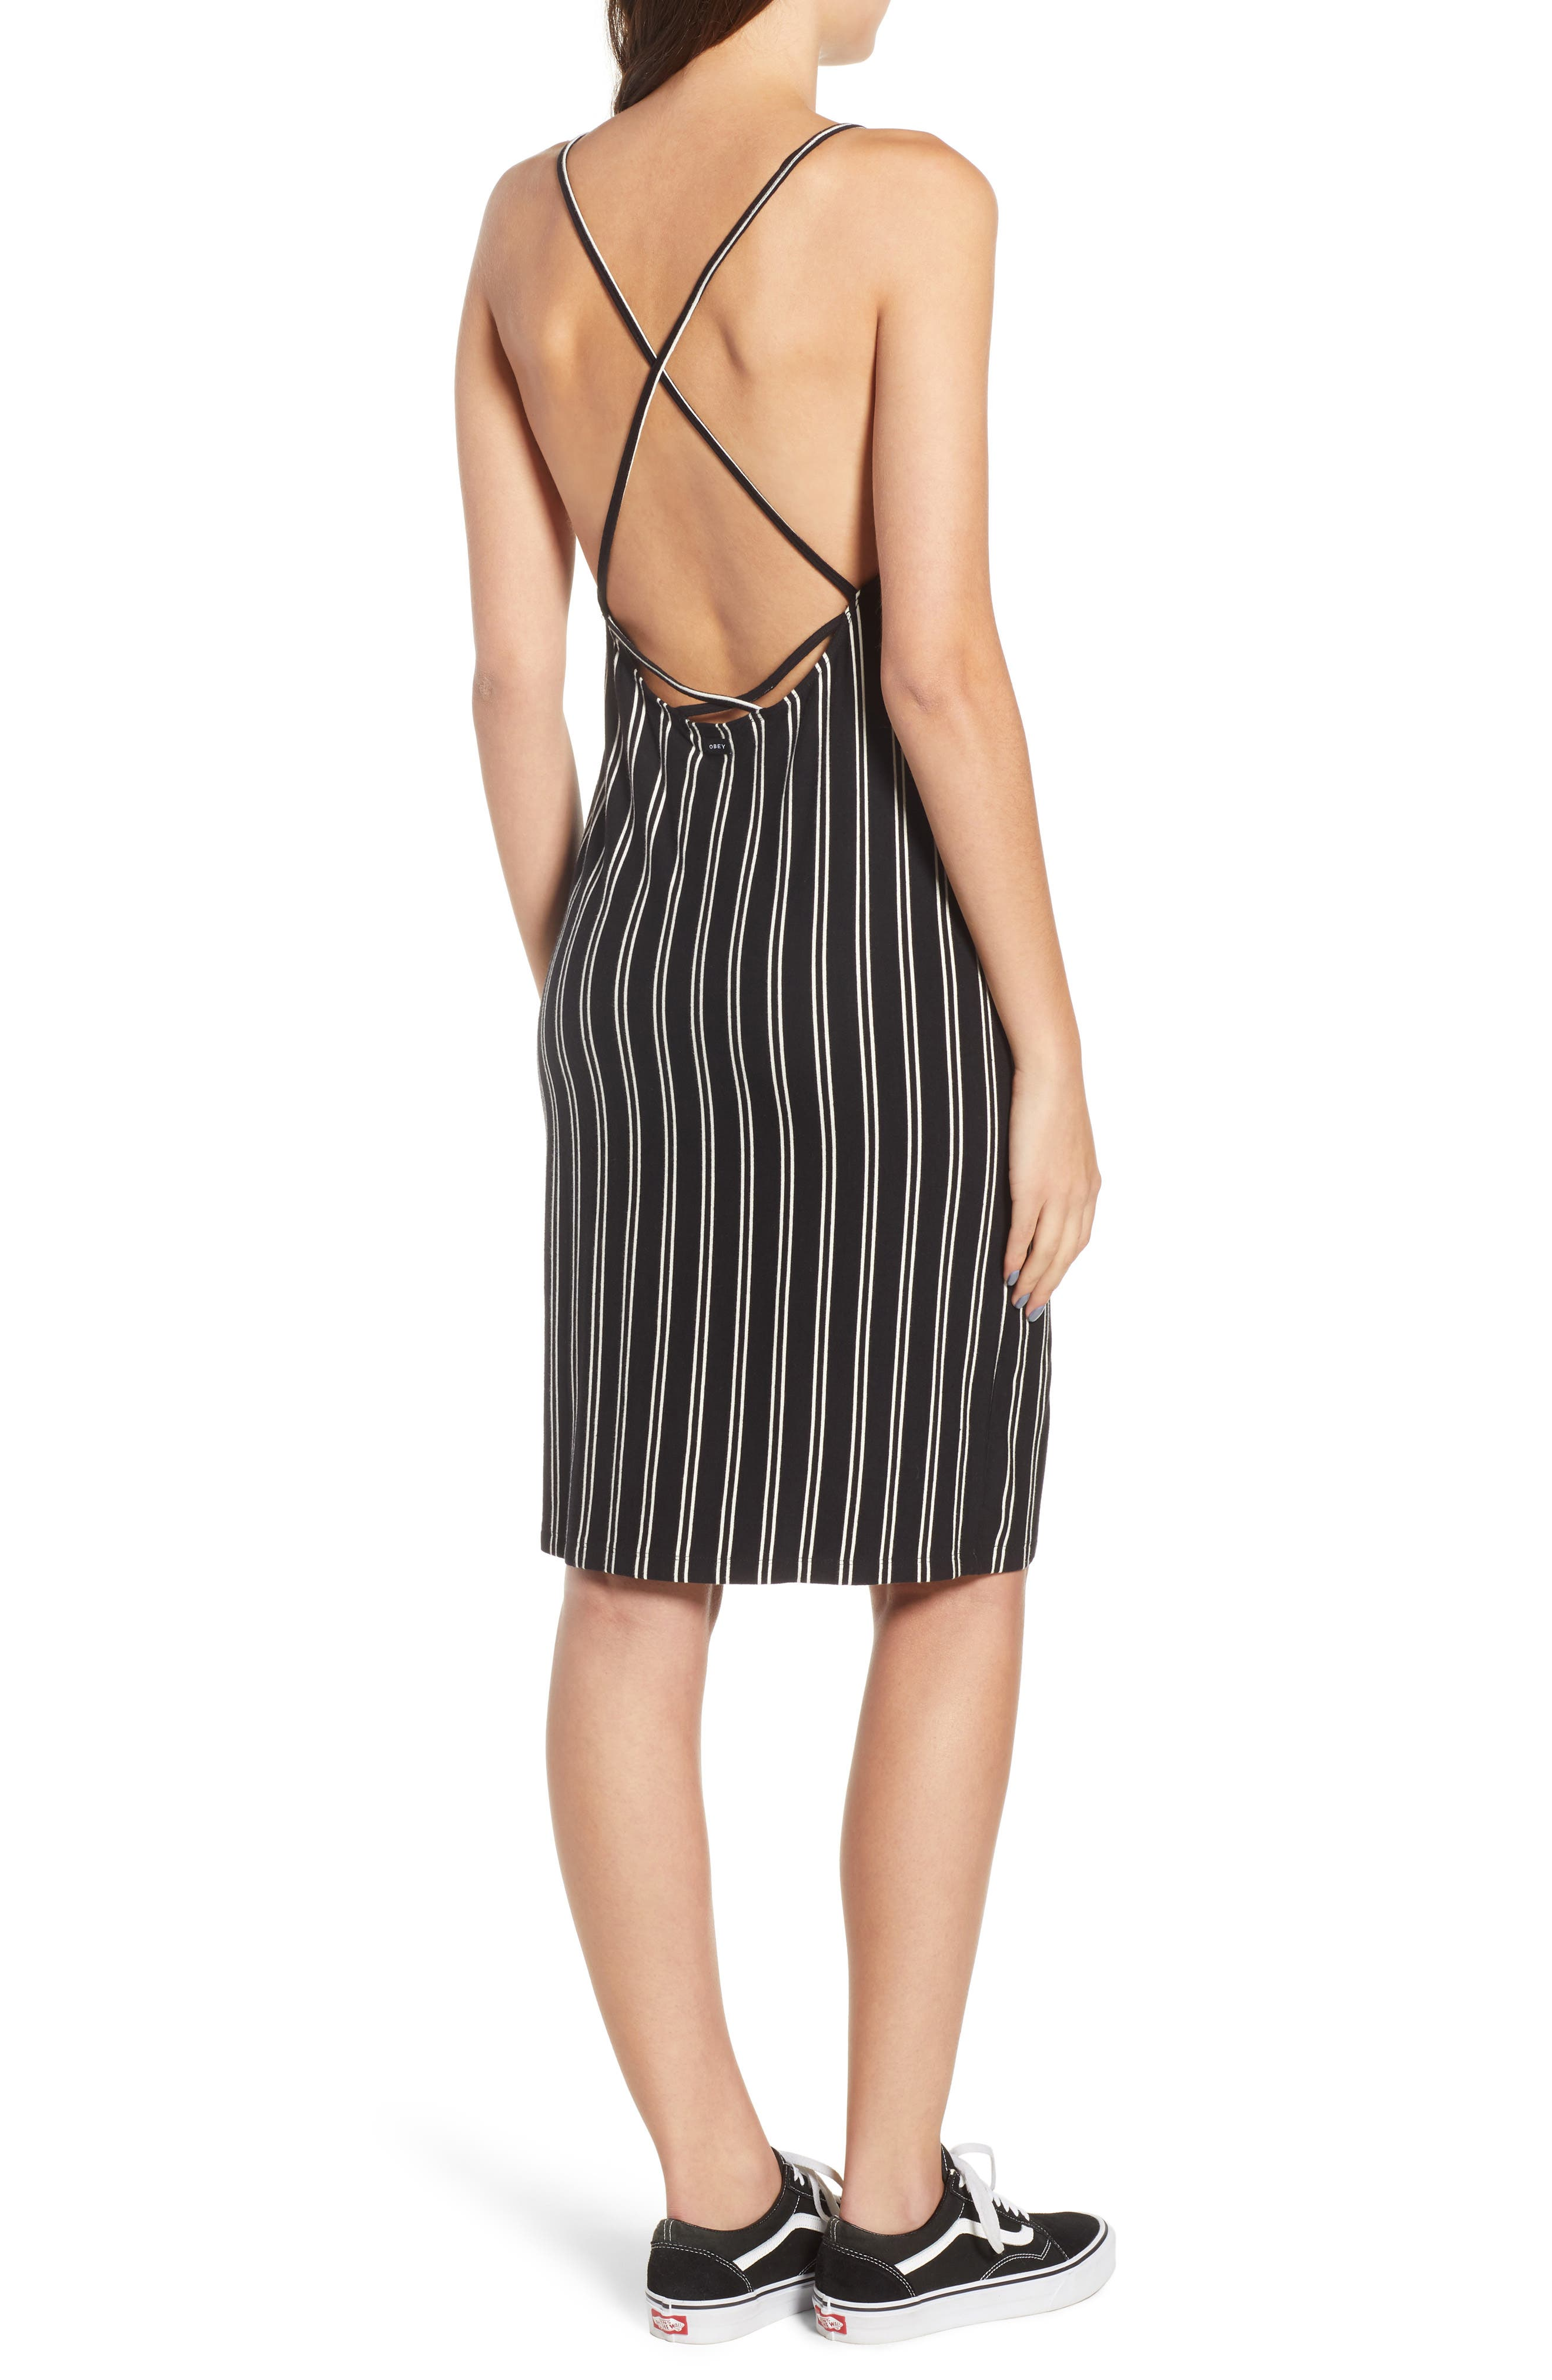 Lockette Strappy Striped Dress,                             Alternate thumbnail 2, color,                             Jet Black Multi